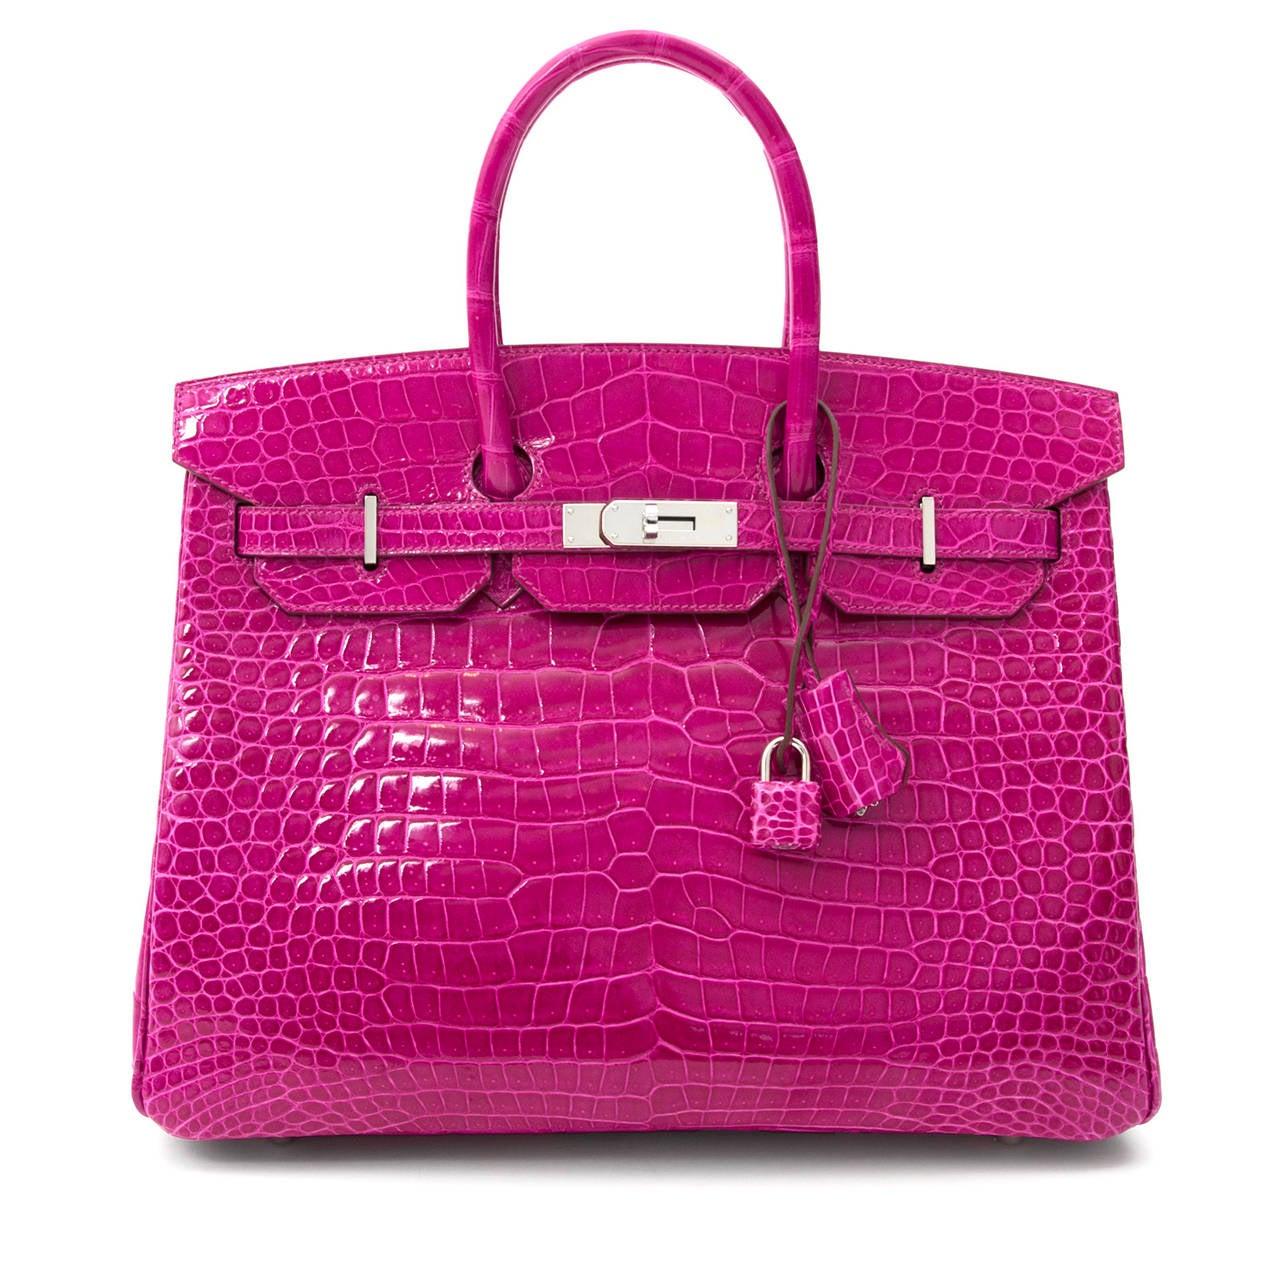 Hermès Birkin Corocodile Porosus PHW Rose Sheherazade 35 2